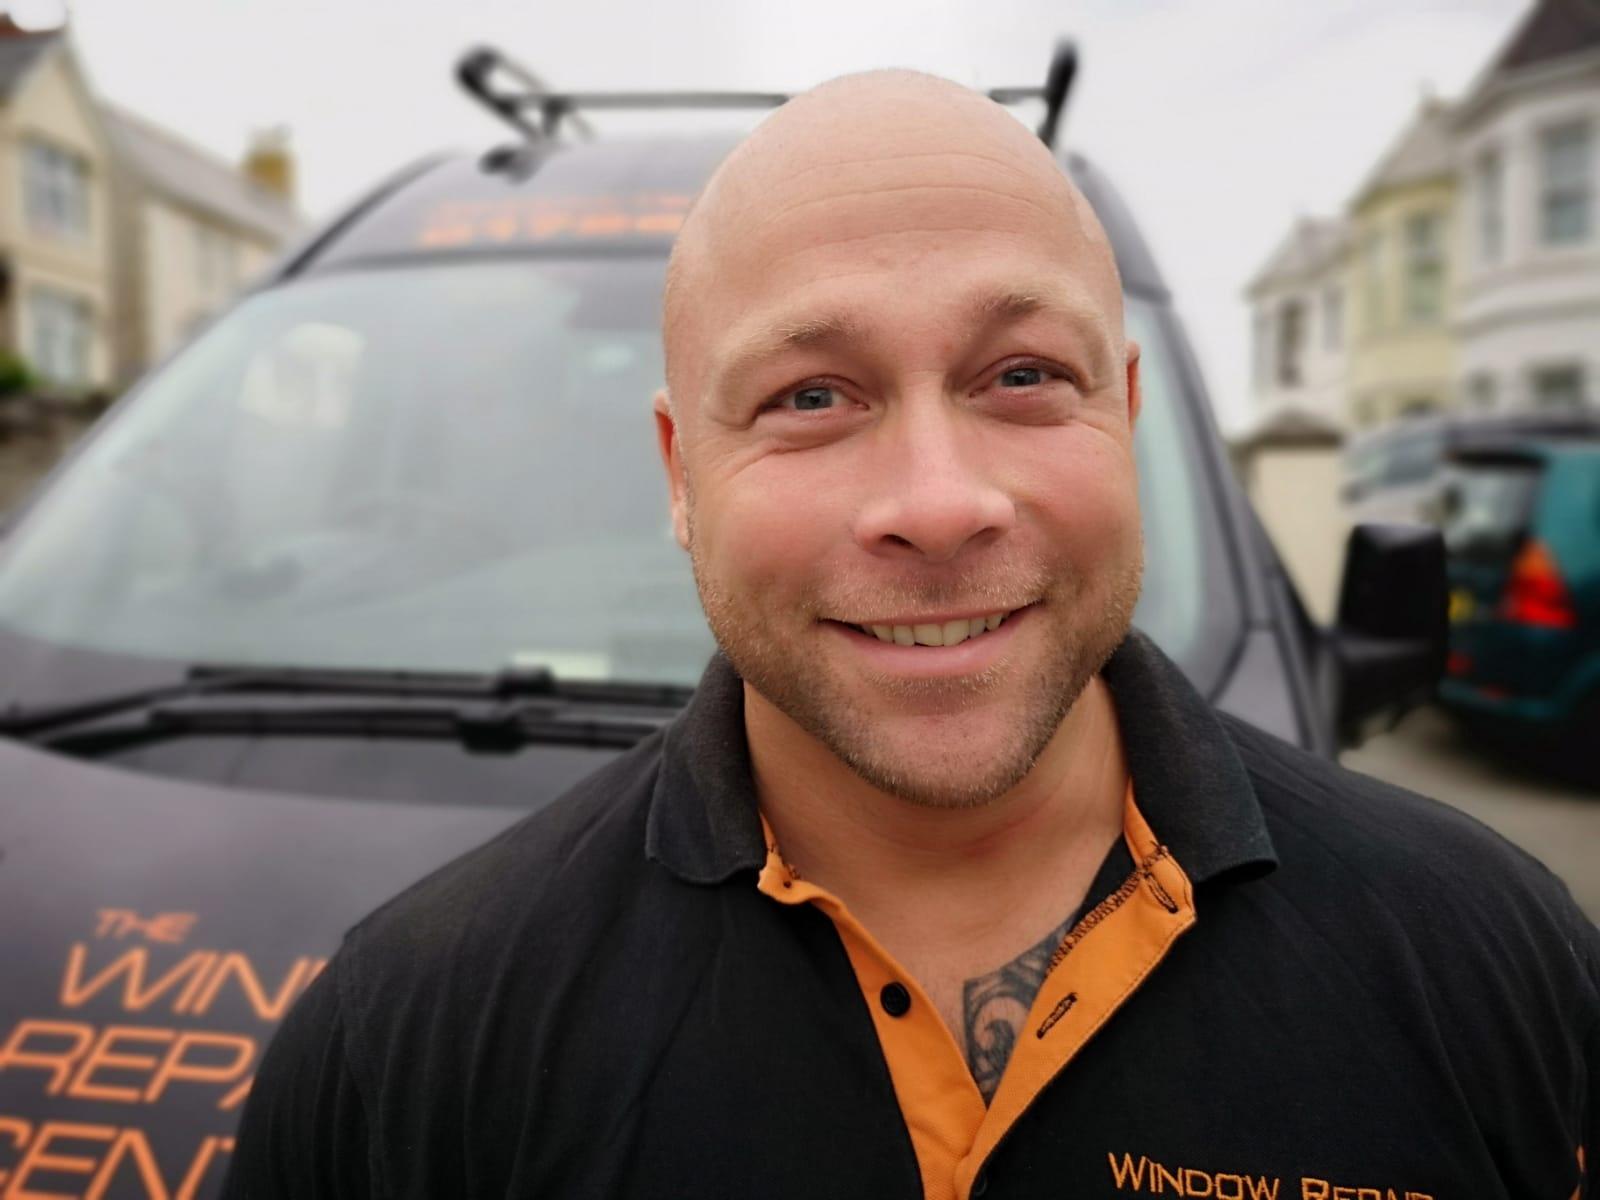 Adam at the Window Repair Centre Cornwall